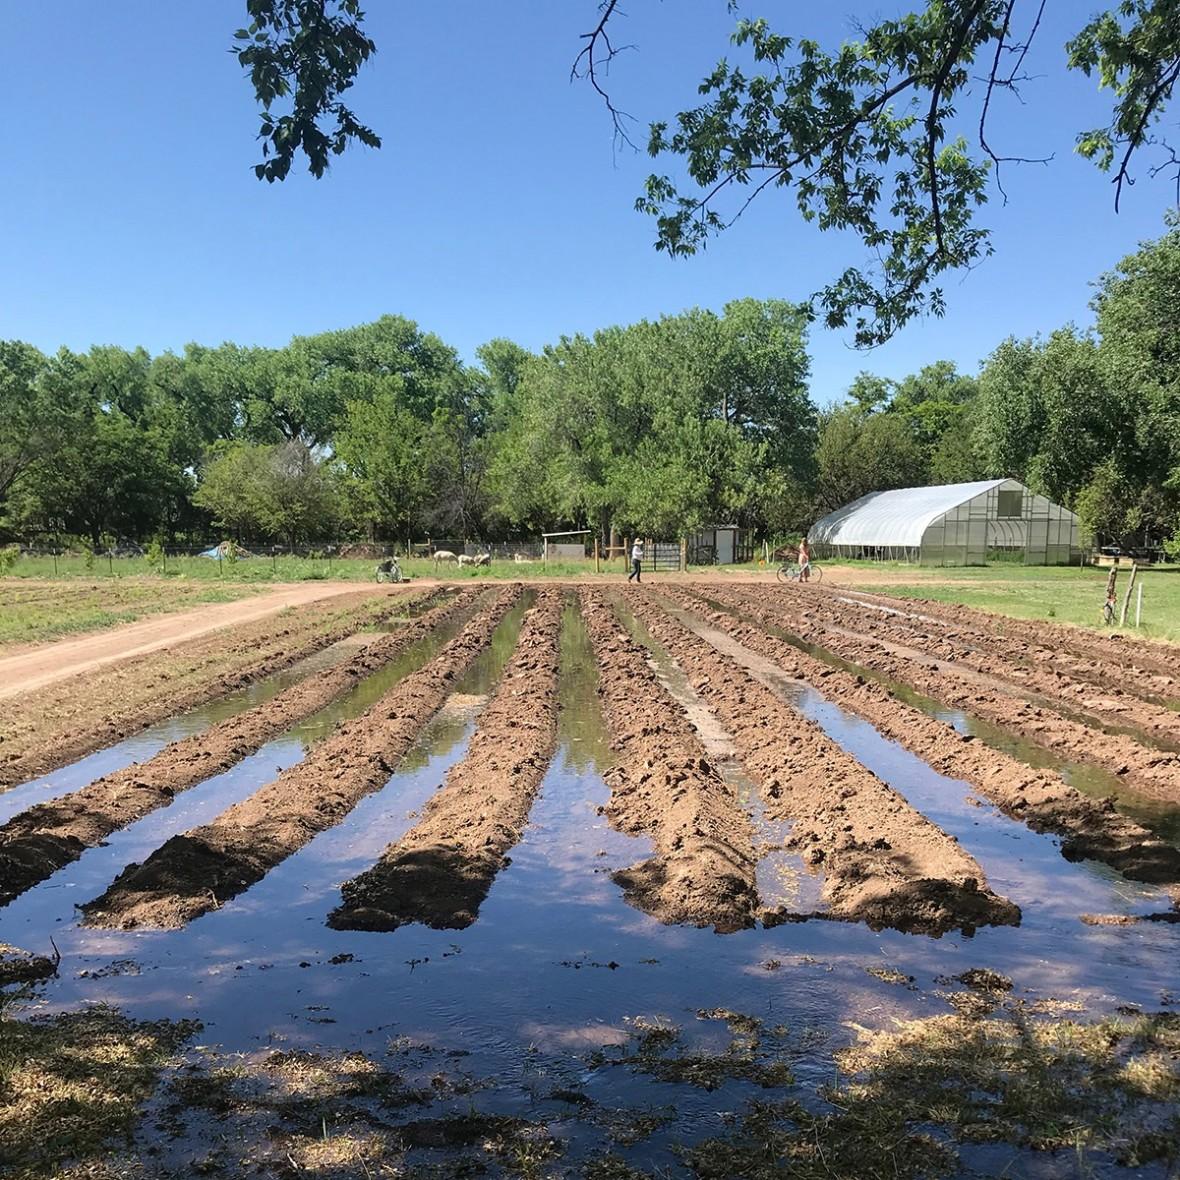 ancient field irrigation